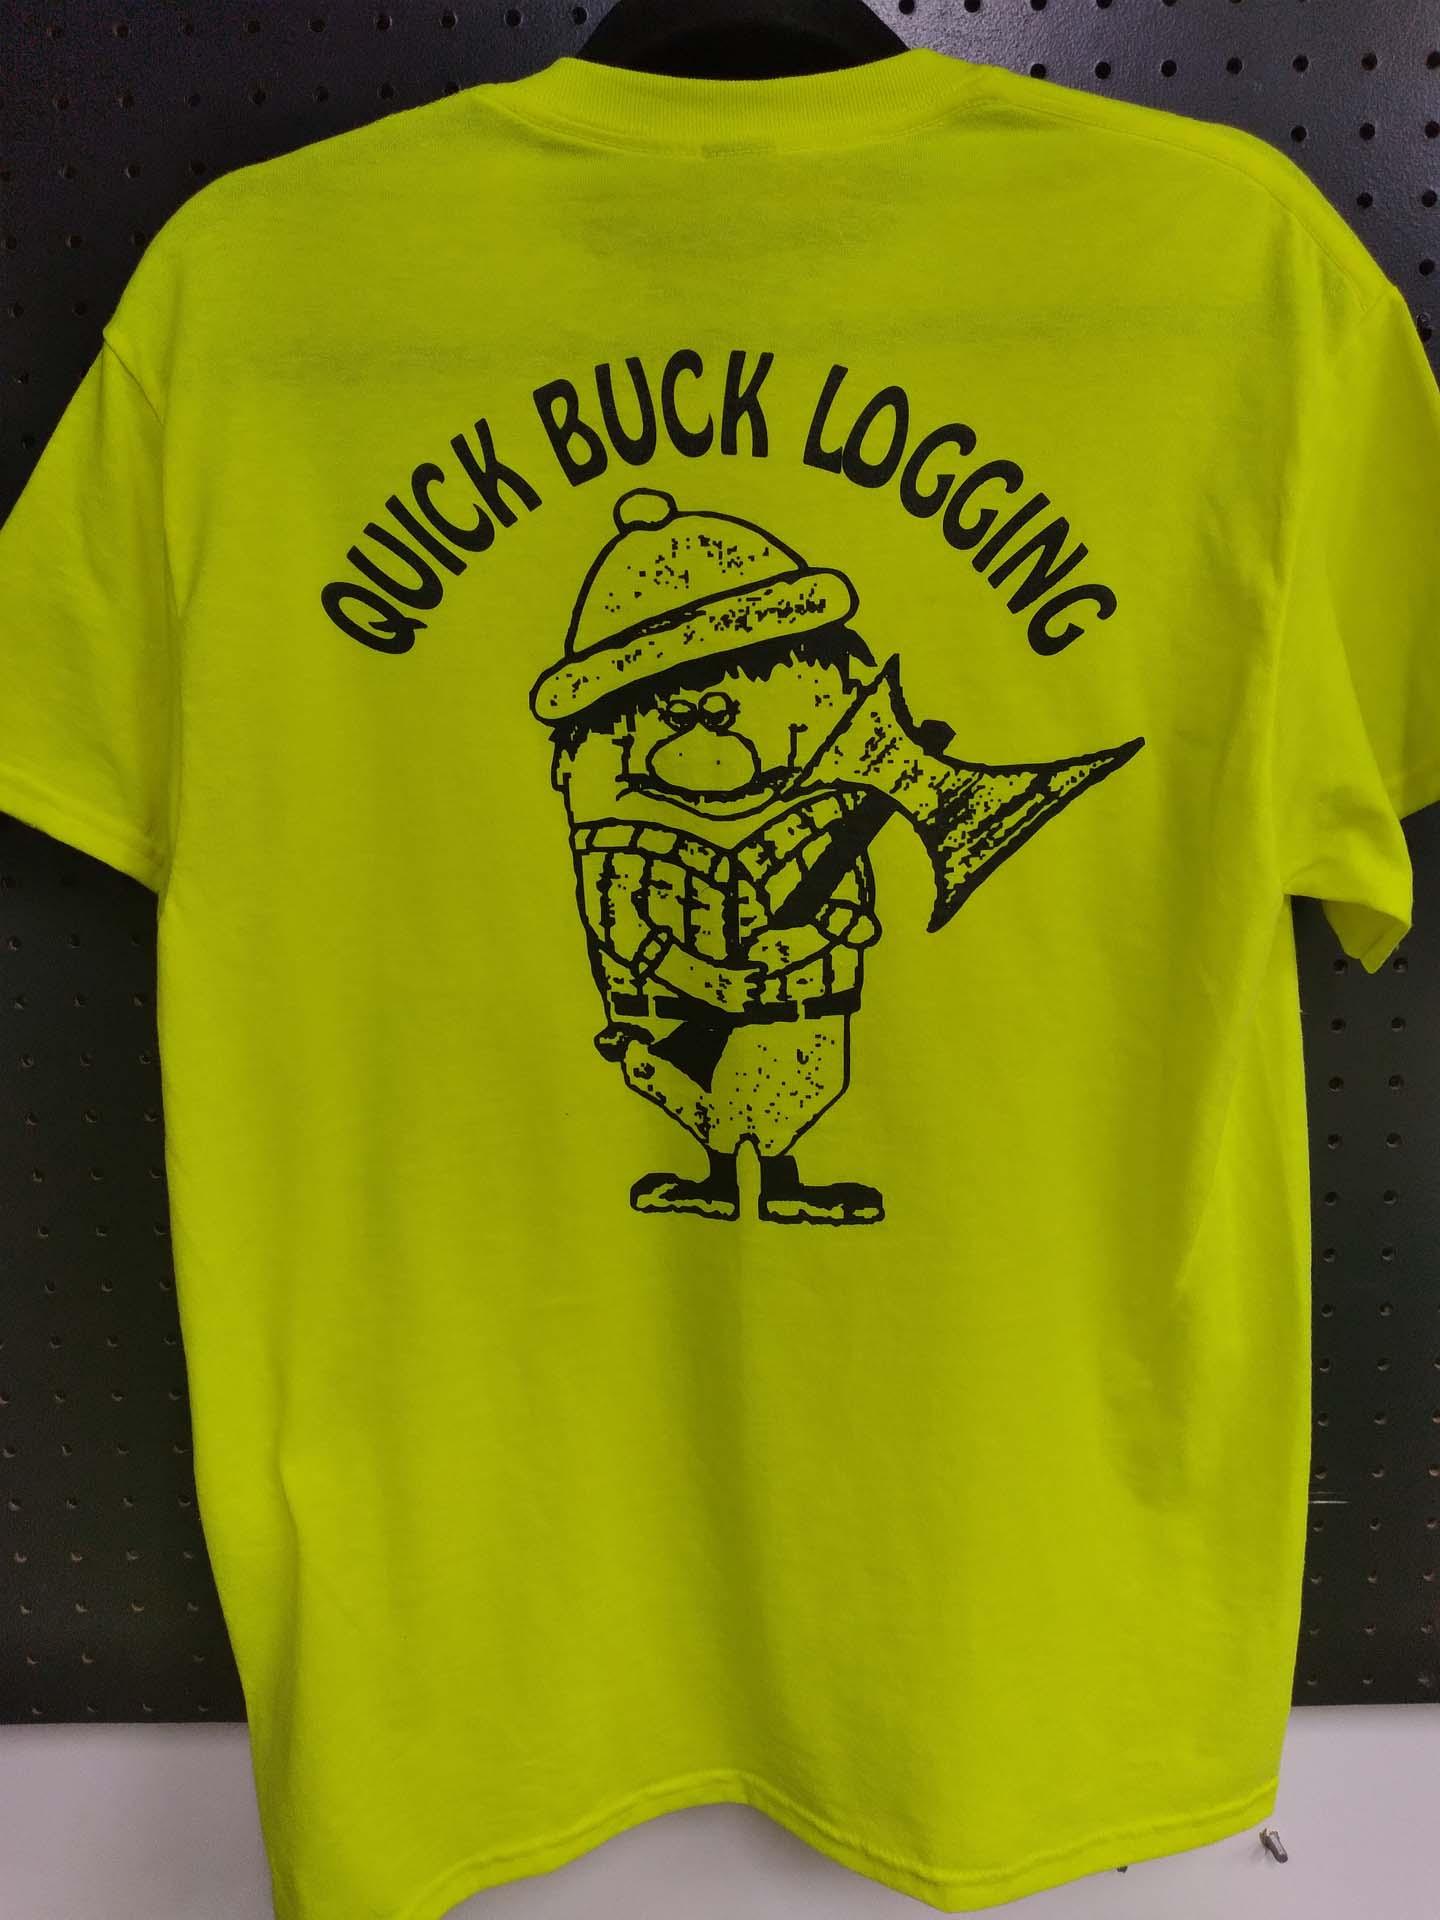 Quickbuck